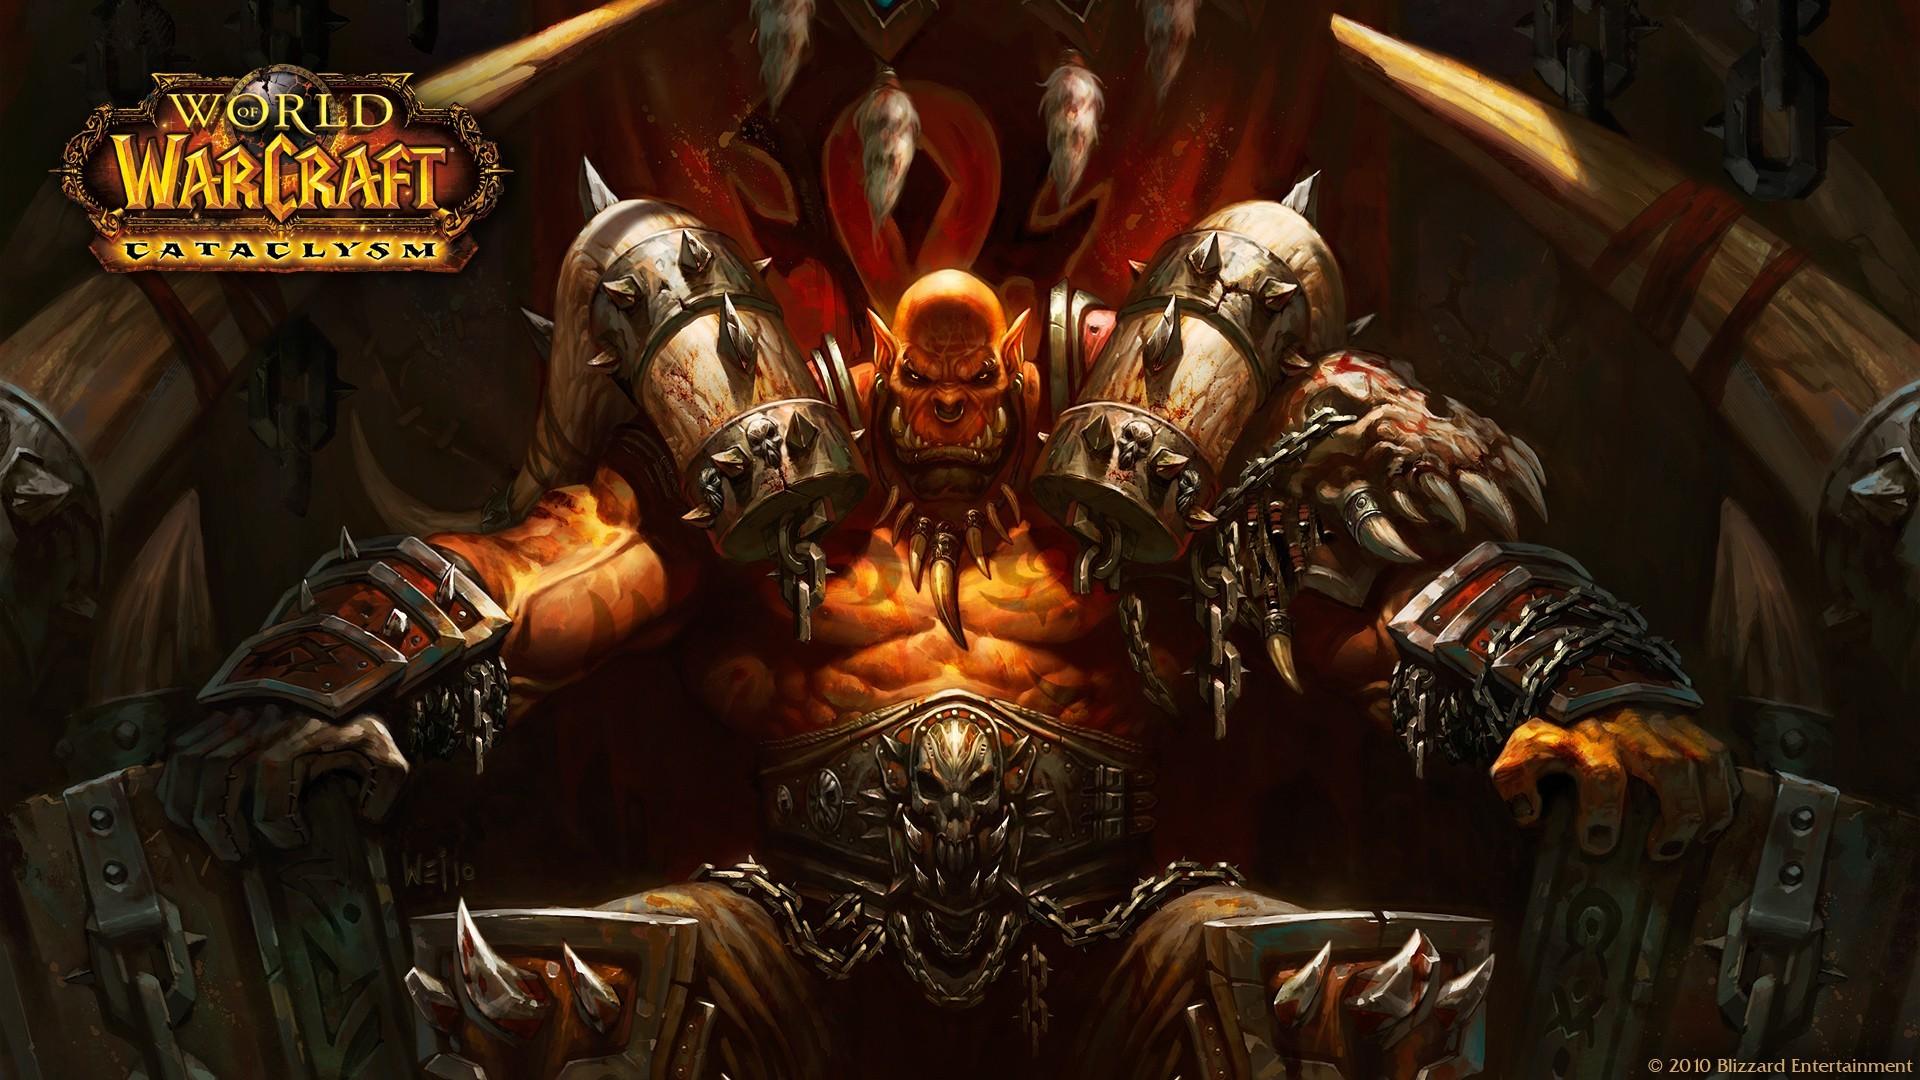 Wallpaper 1920x1080 Px Orcs World Of Warcraft World Of Warcraft